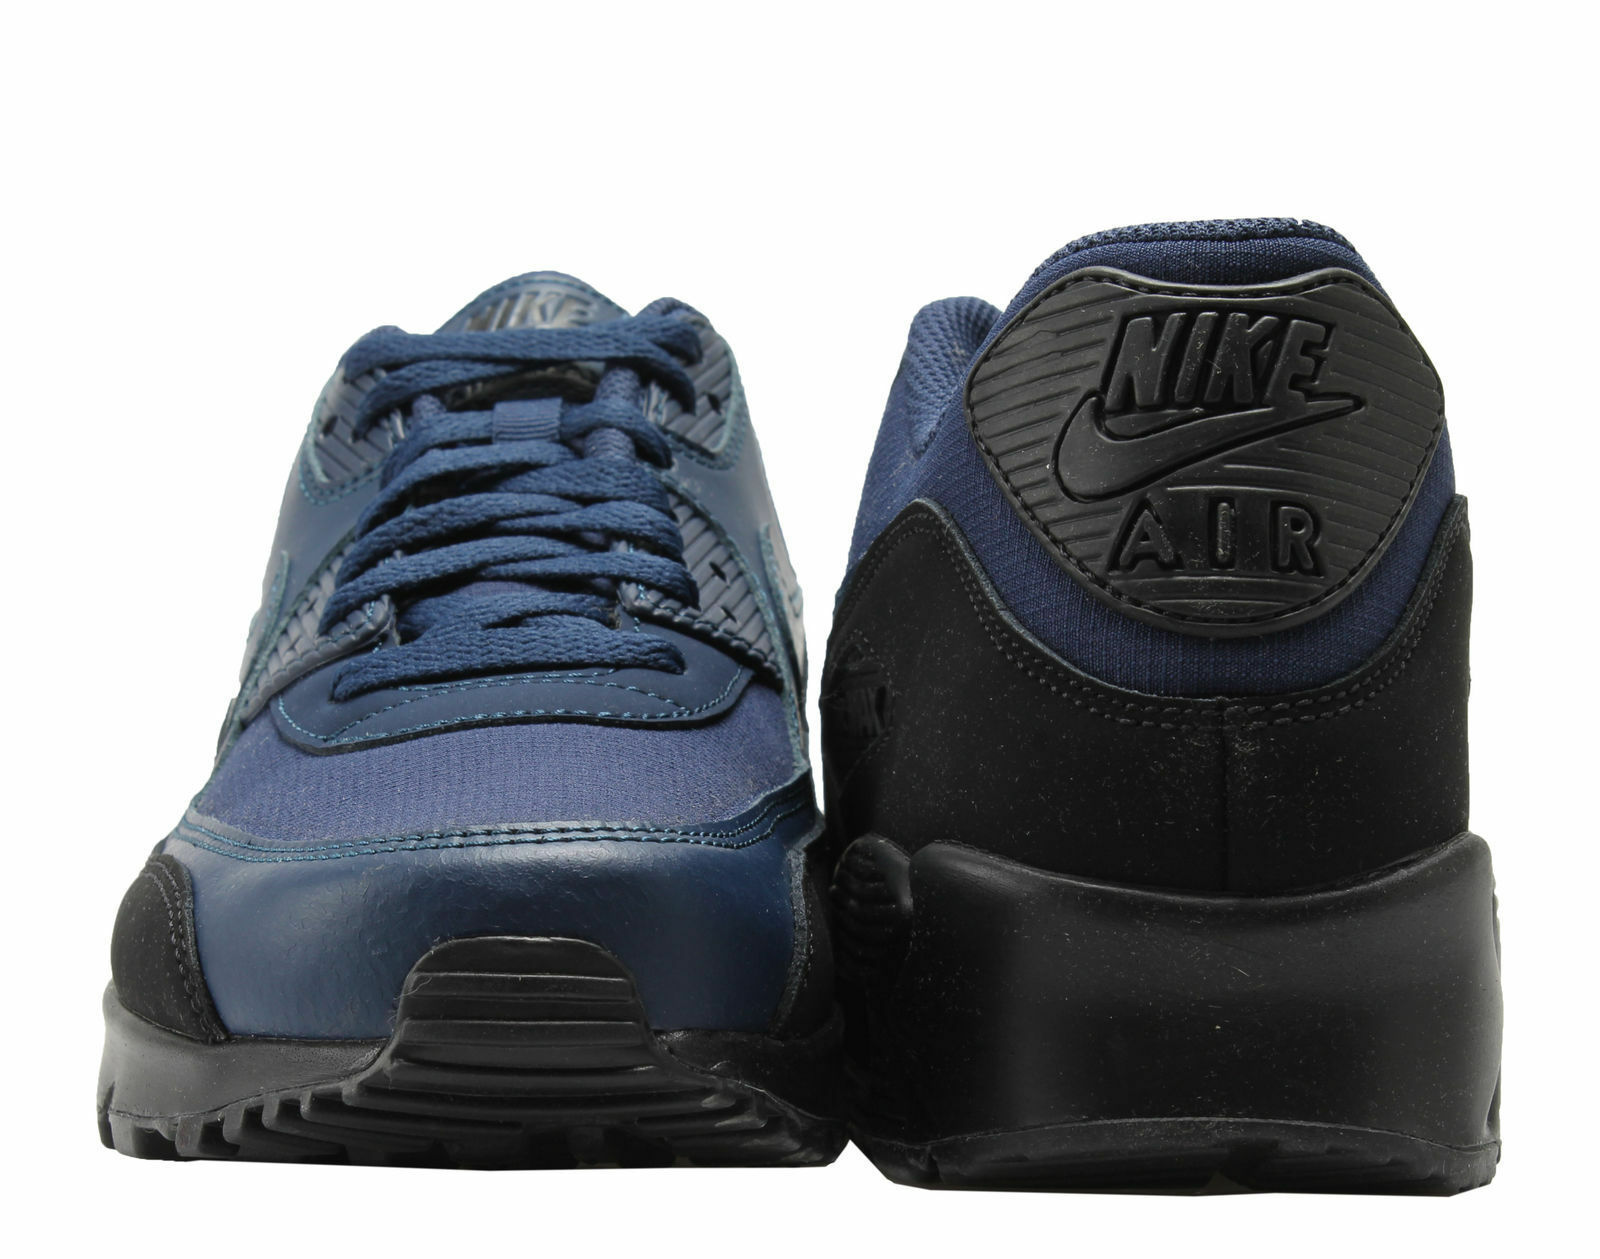 Nike Air Max 90 Essential Sneakers Black Midnight Navy Blue Trainers AJ1285-007